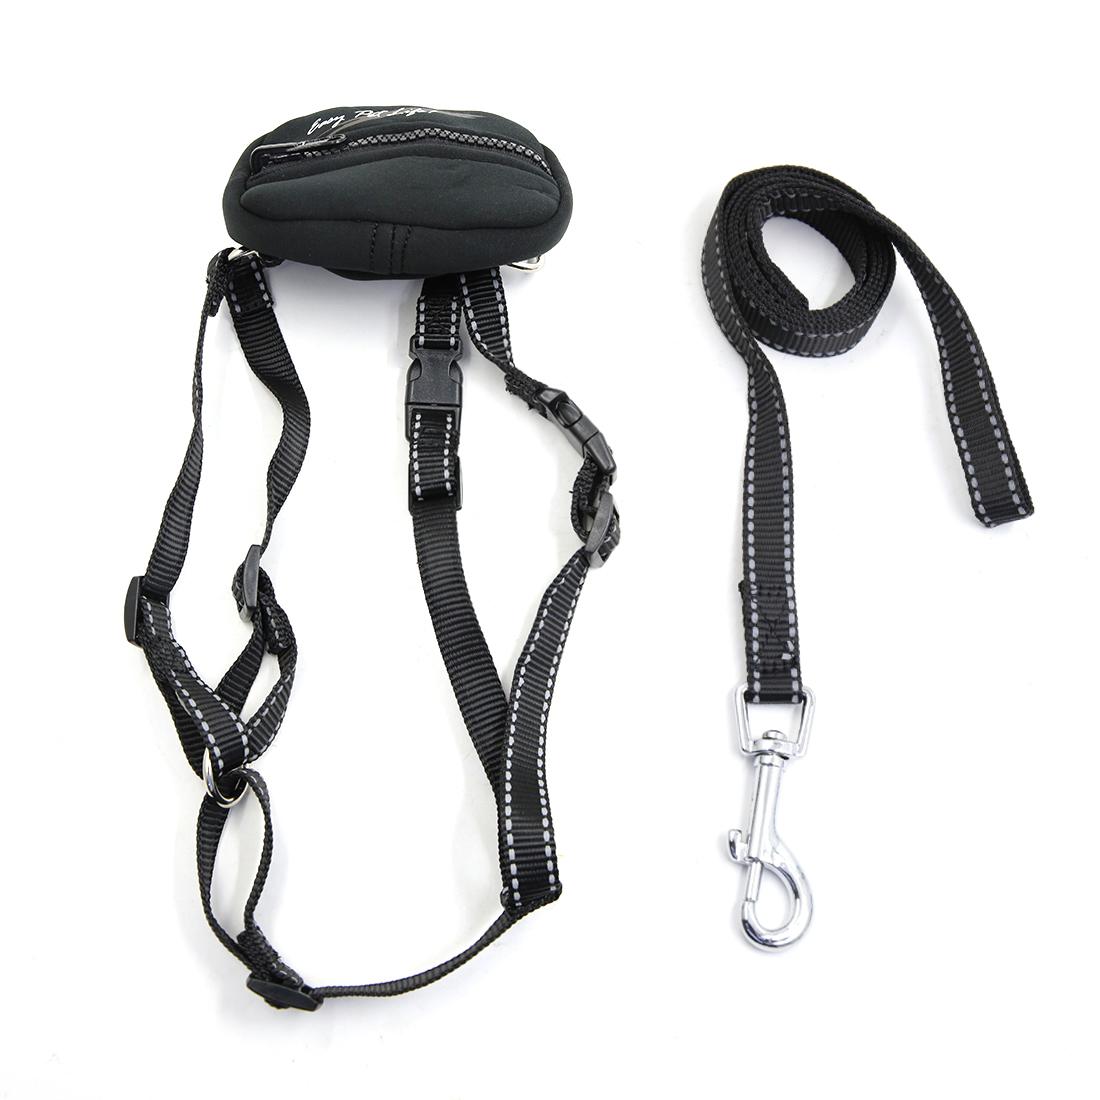 Safe Reflective Dog Harness Leash Adjustable Nylon Collar For Walking with Storage Bag Black L